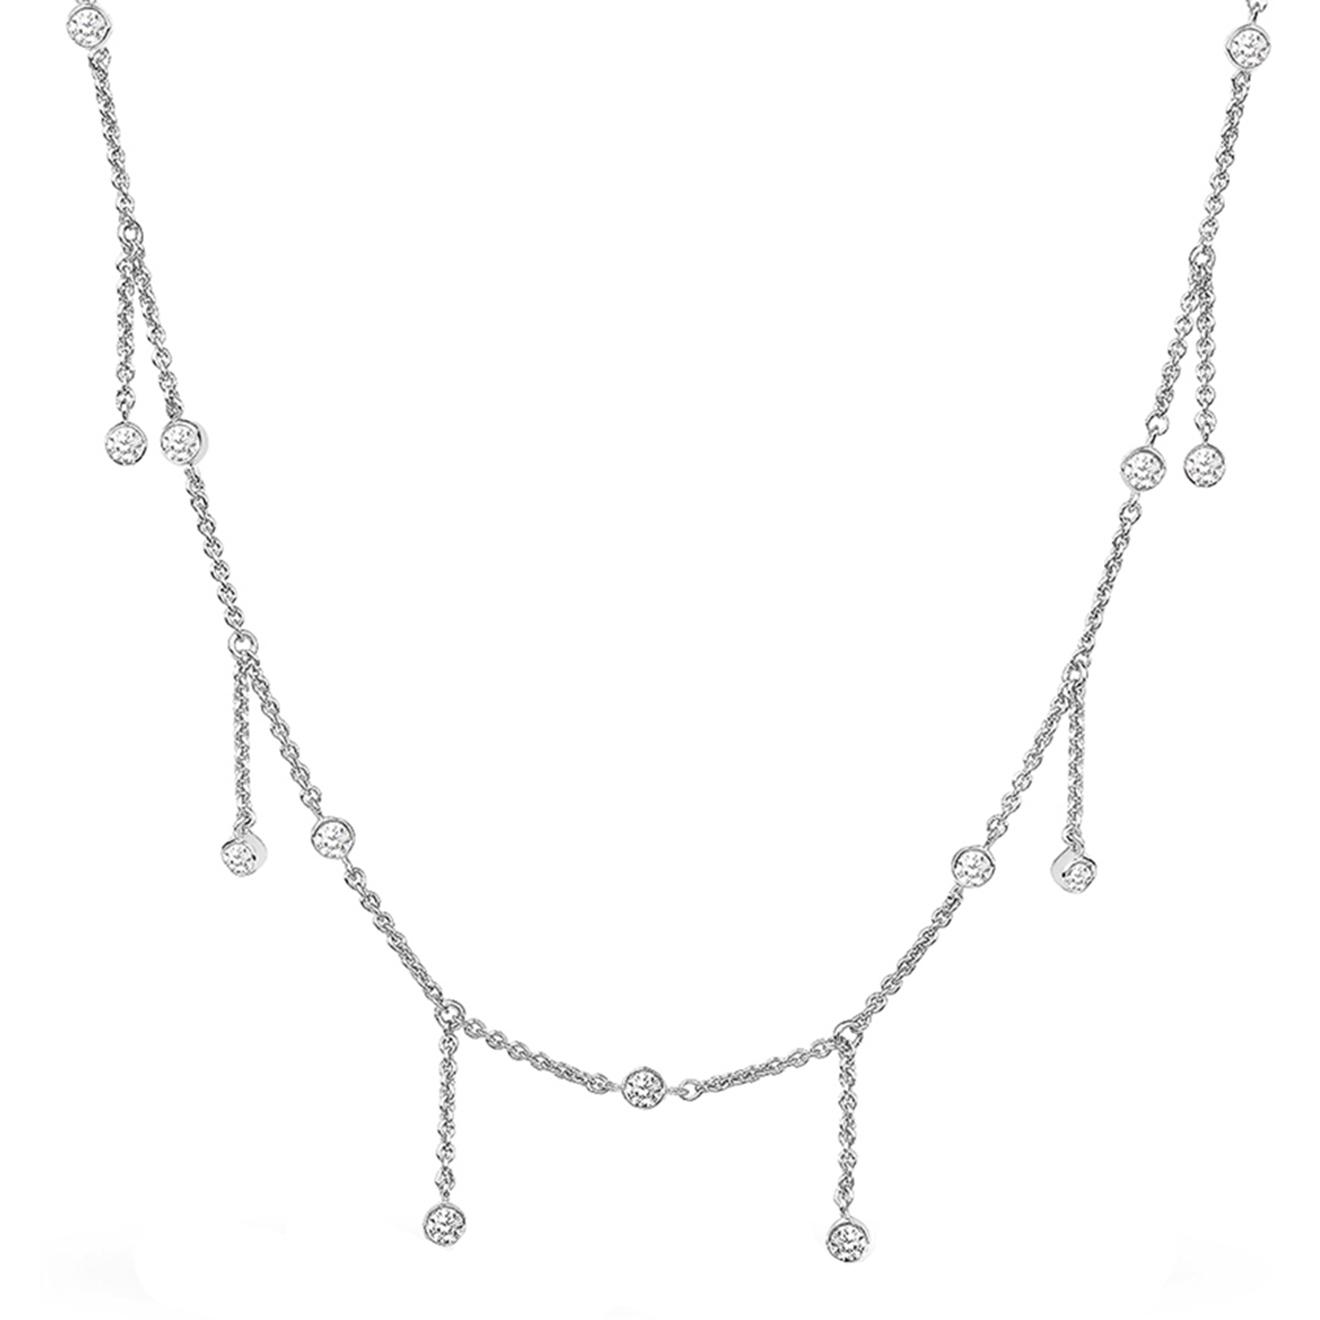 LAVZ Серебряное колье Chain Drops Choker, из коллекции Universe